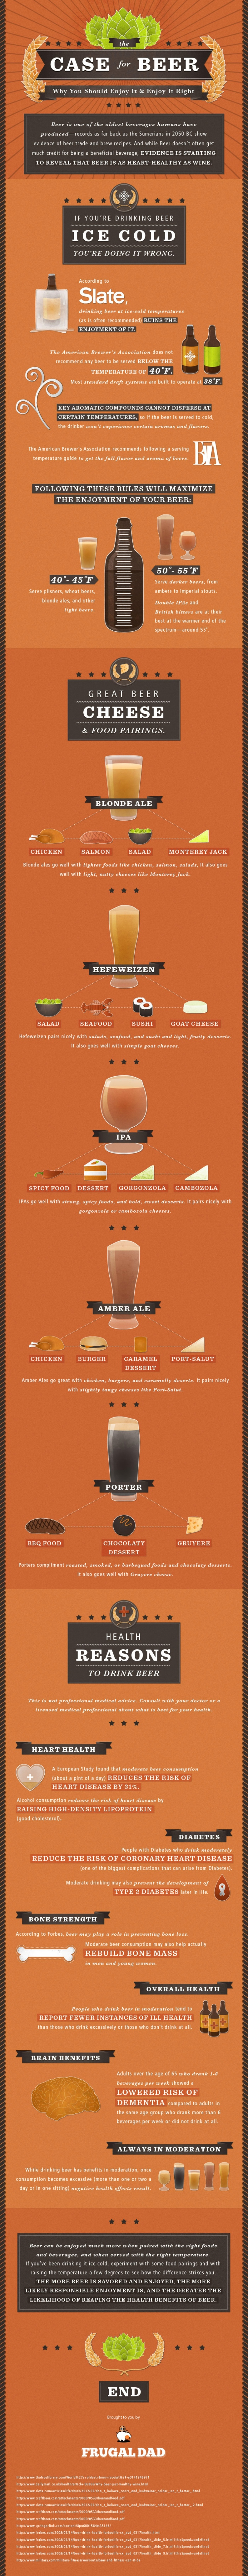 case for beer_110914b22